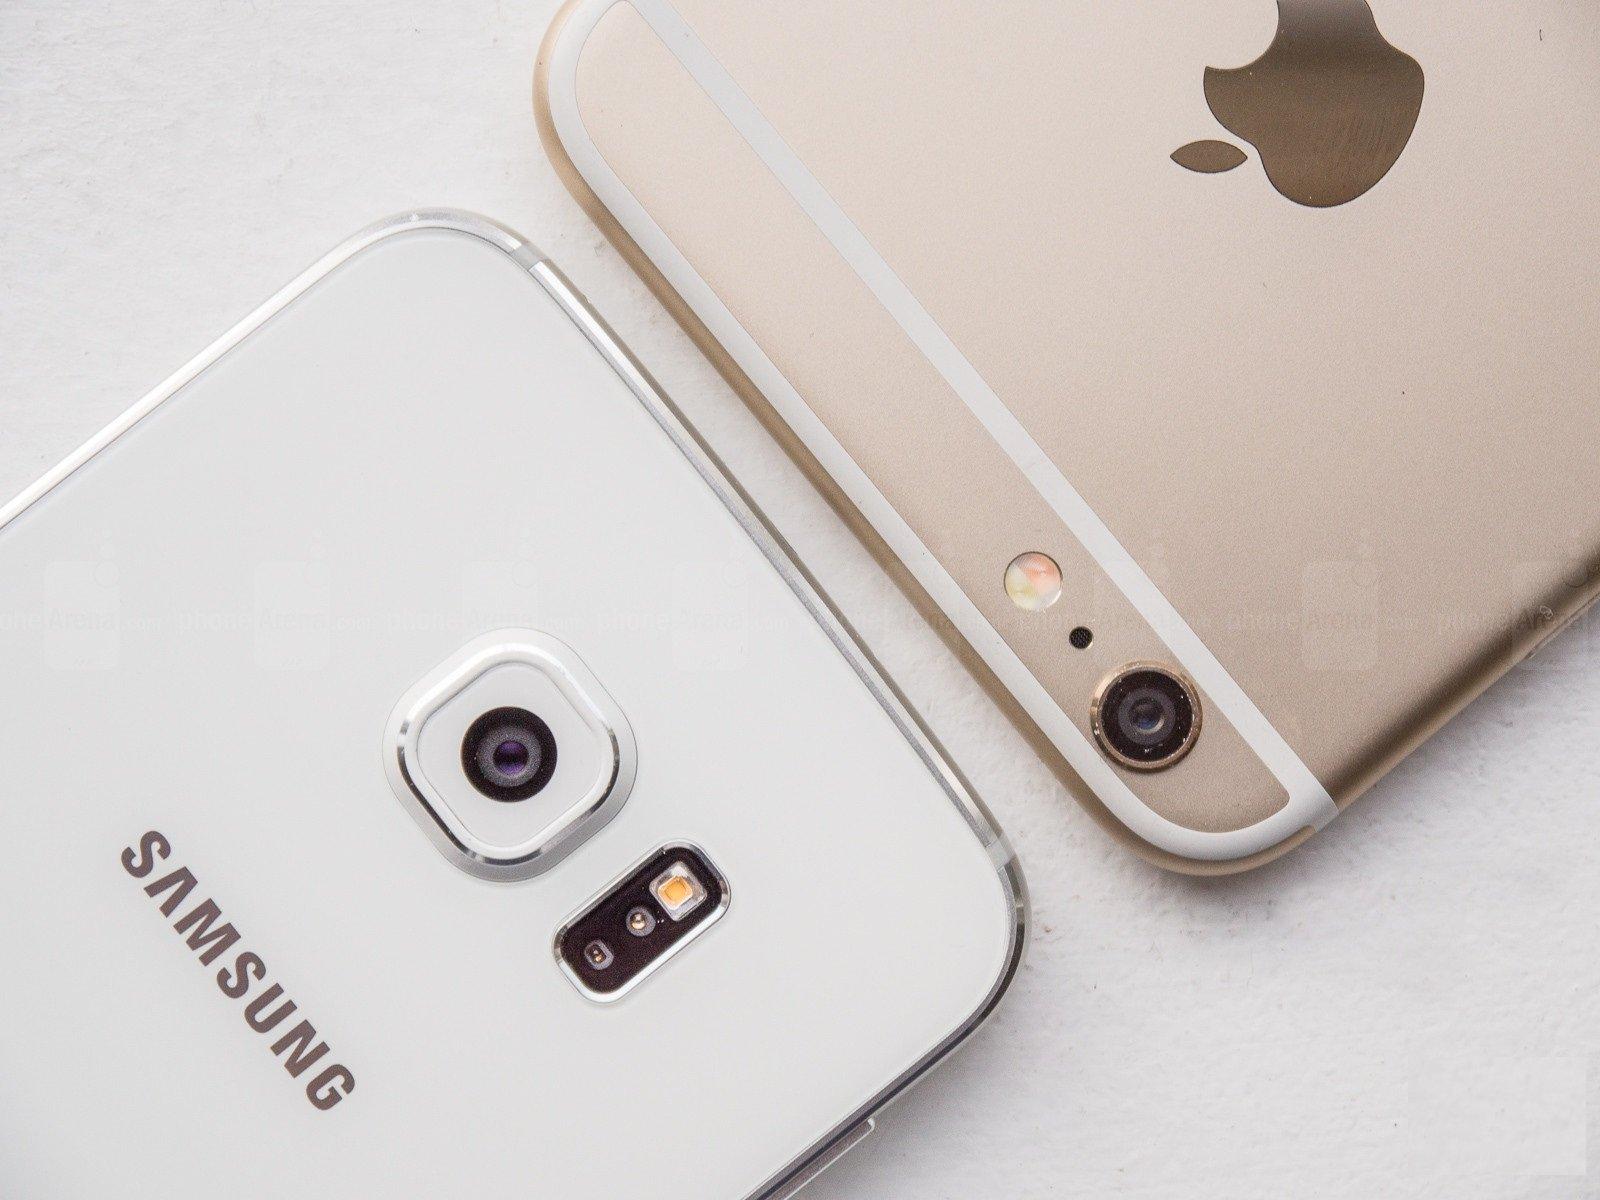 Samsung Galaxy S6 edge vs Apple iPhone 6 Plus 13